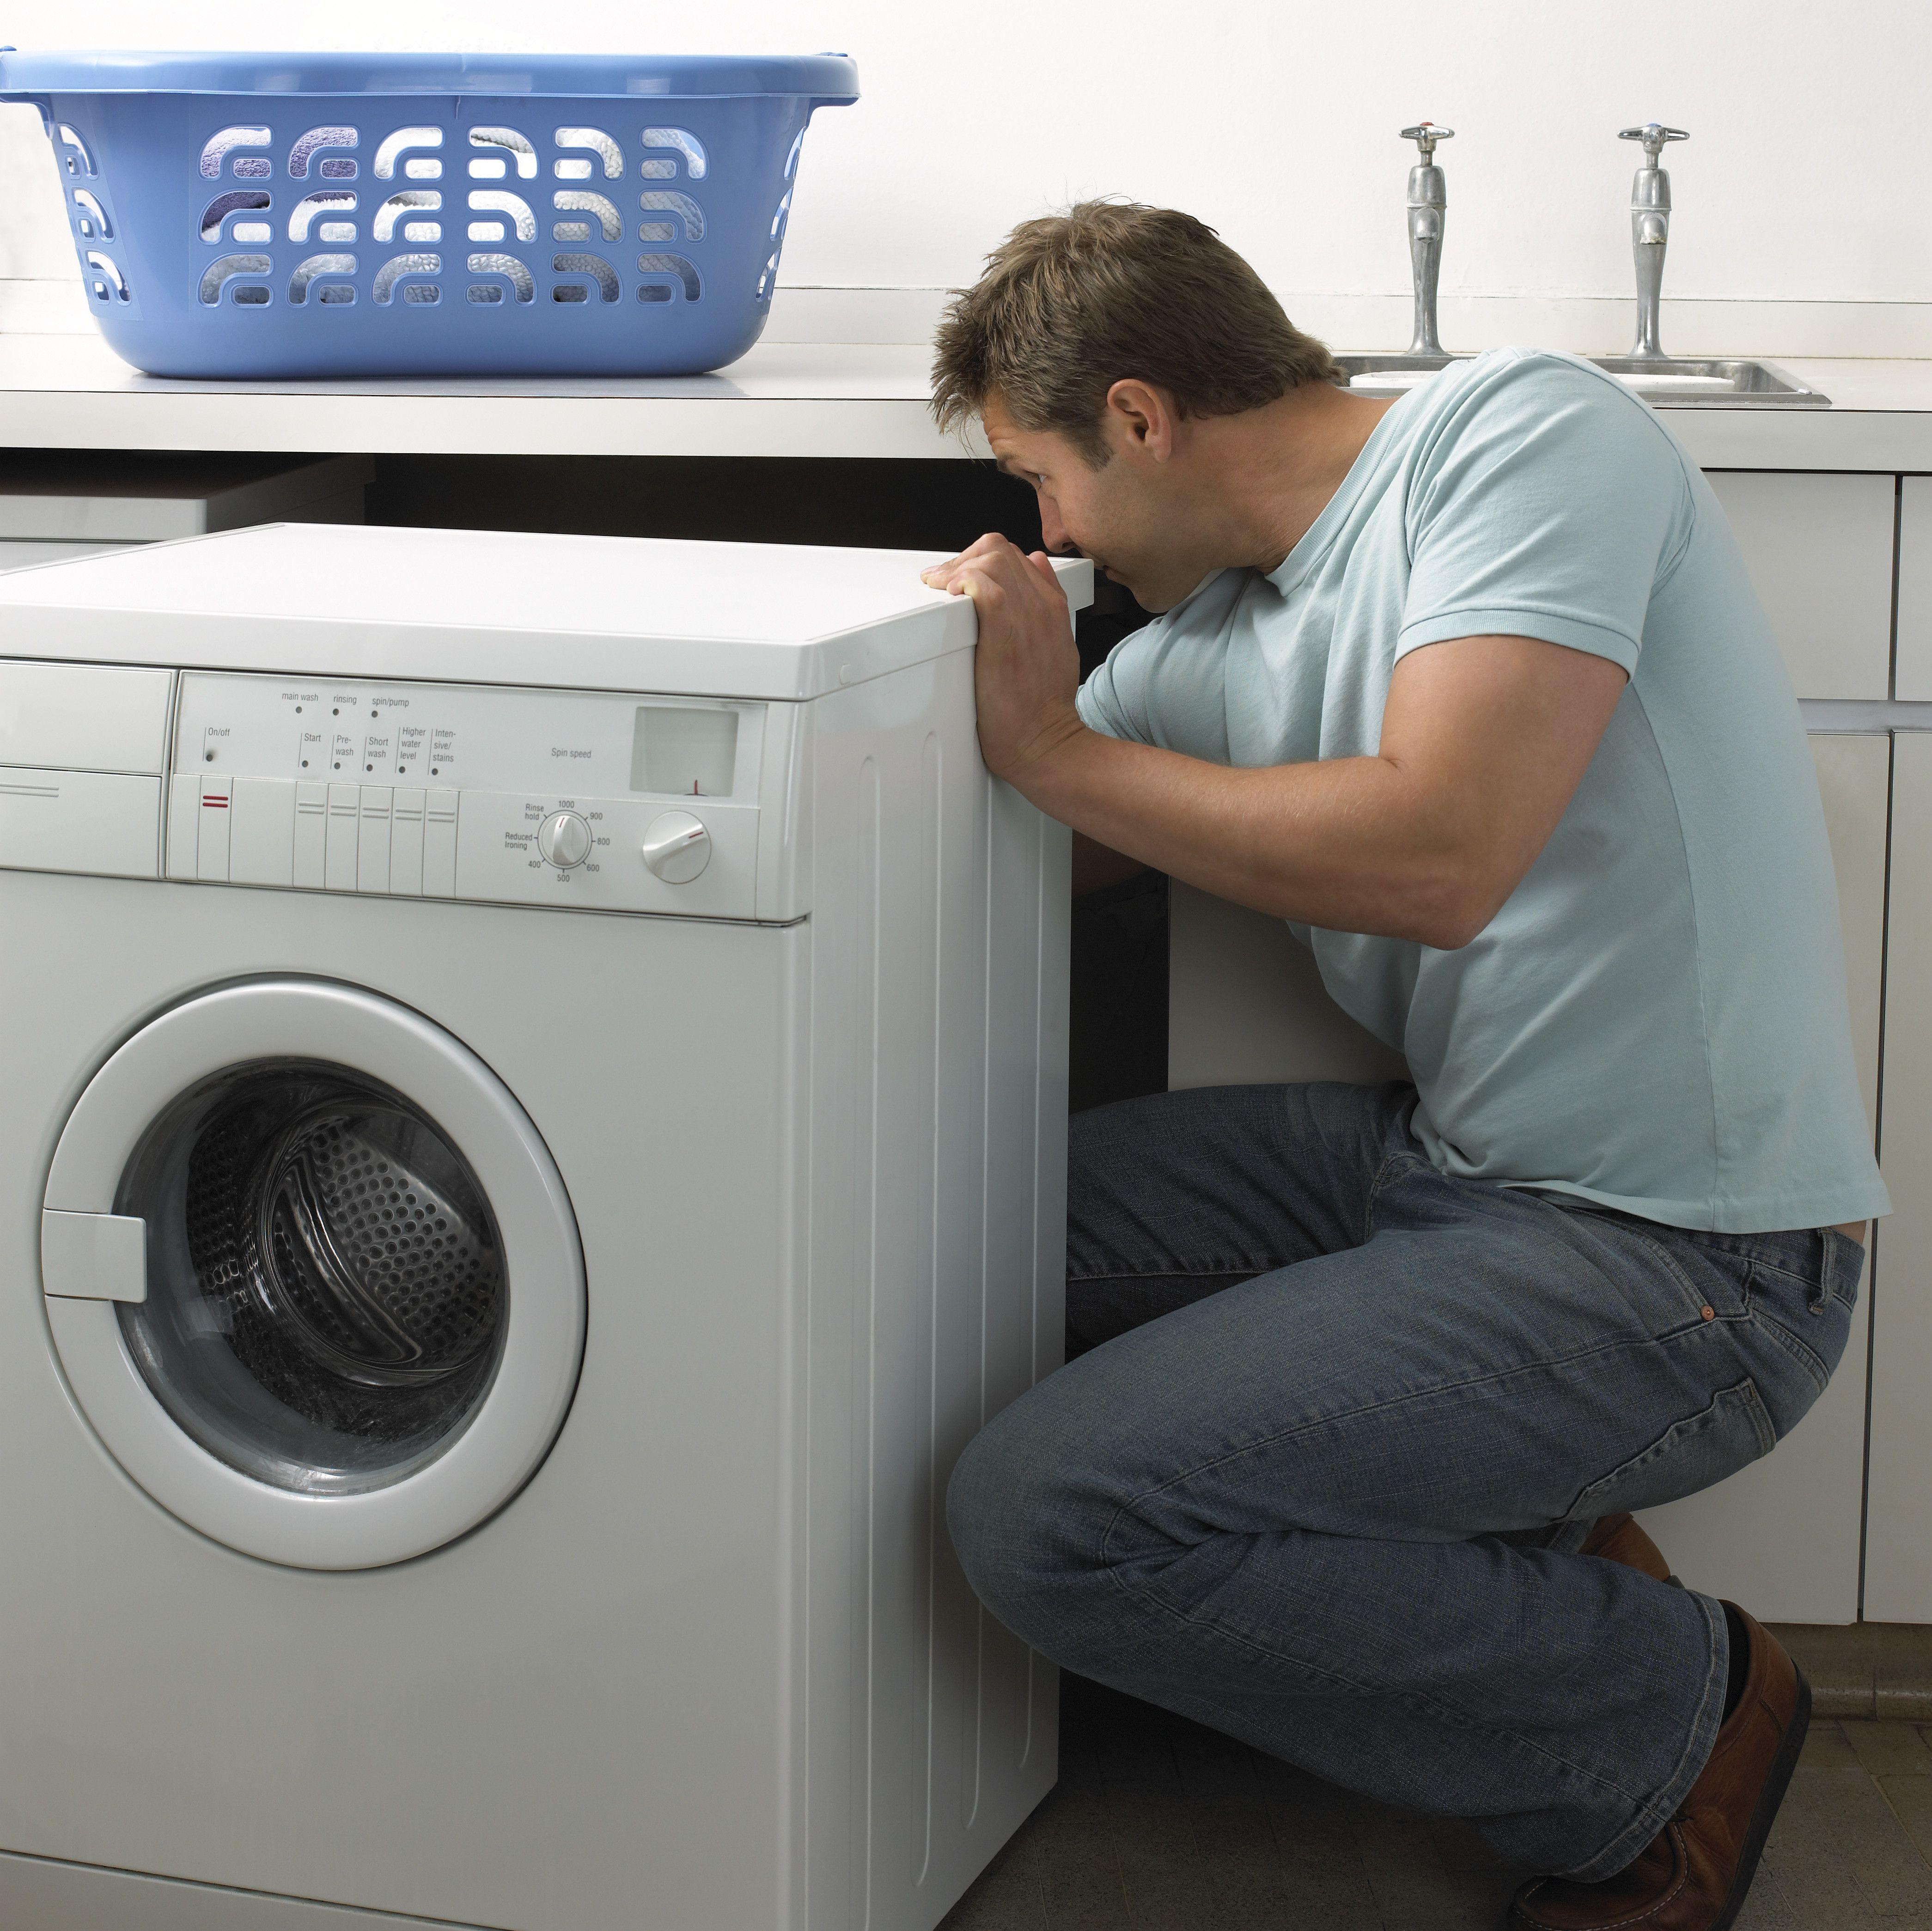 Man in a Kitchen Repairing a Washing Machine